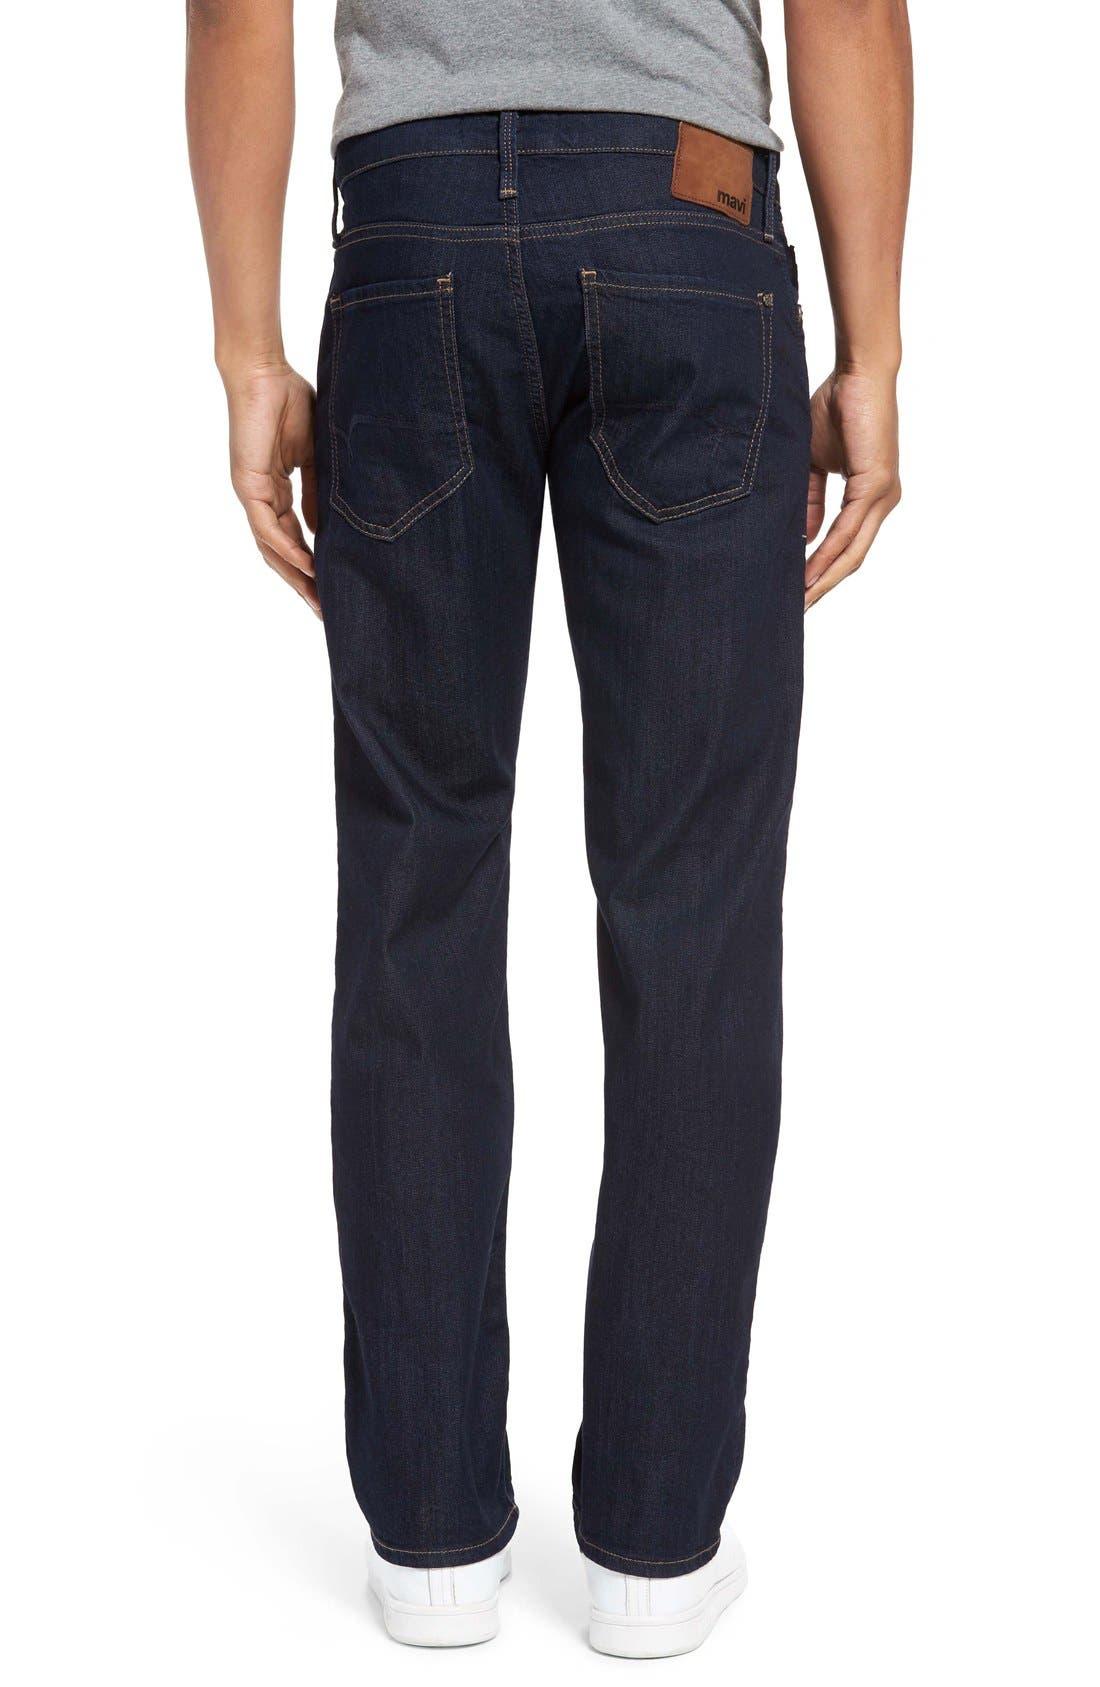 Alternate Image 2  - Mavi Jeans 'Zach' Straight Leg Jeans (Dark Blue)